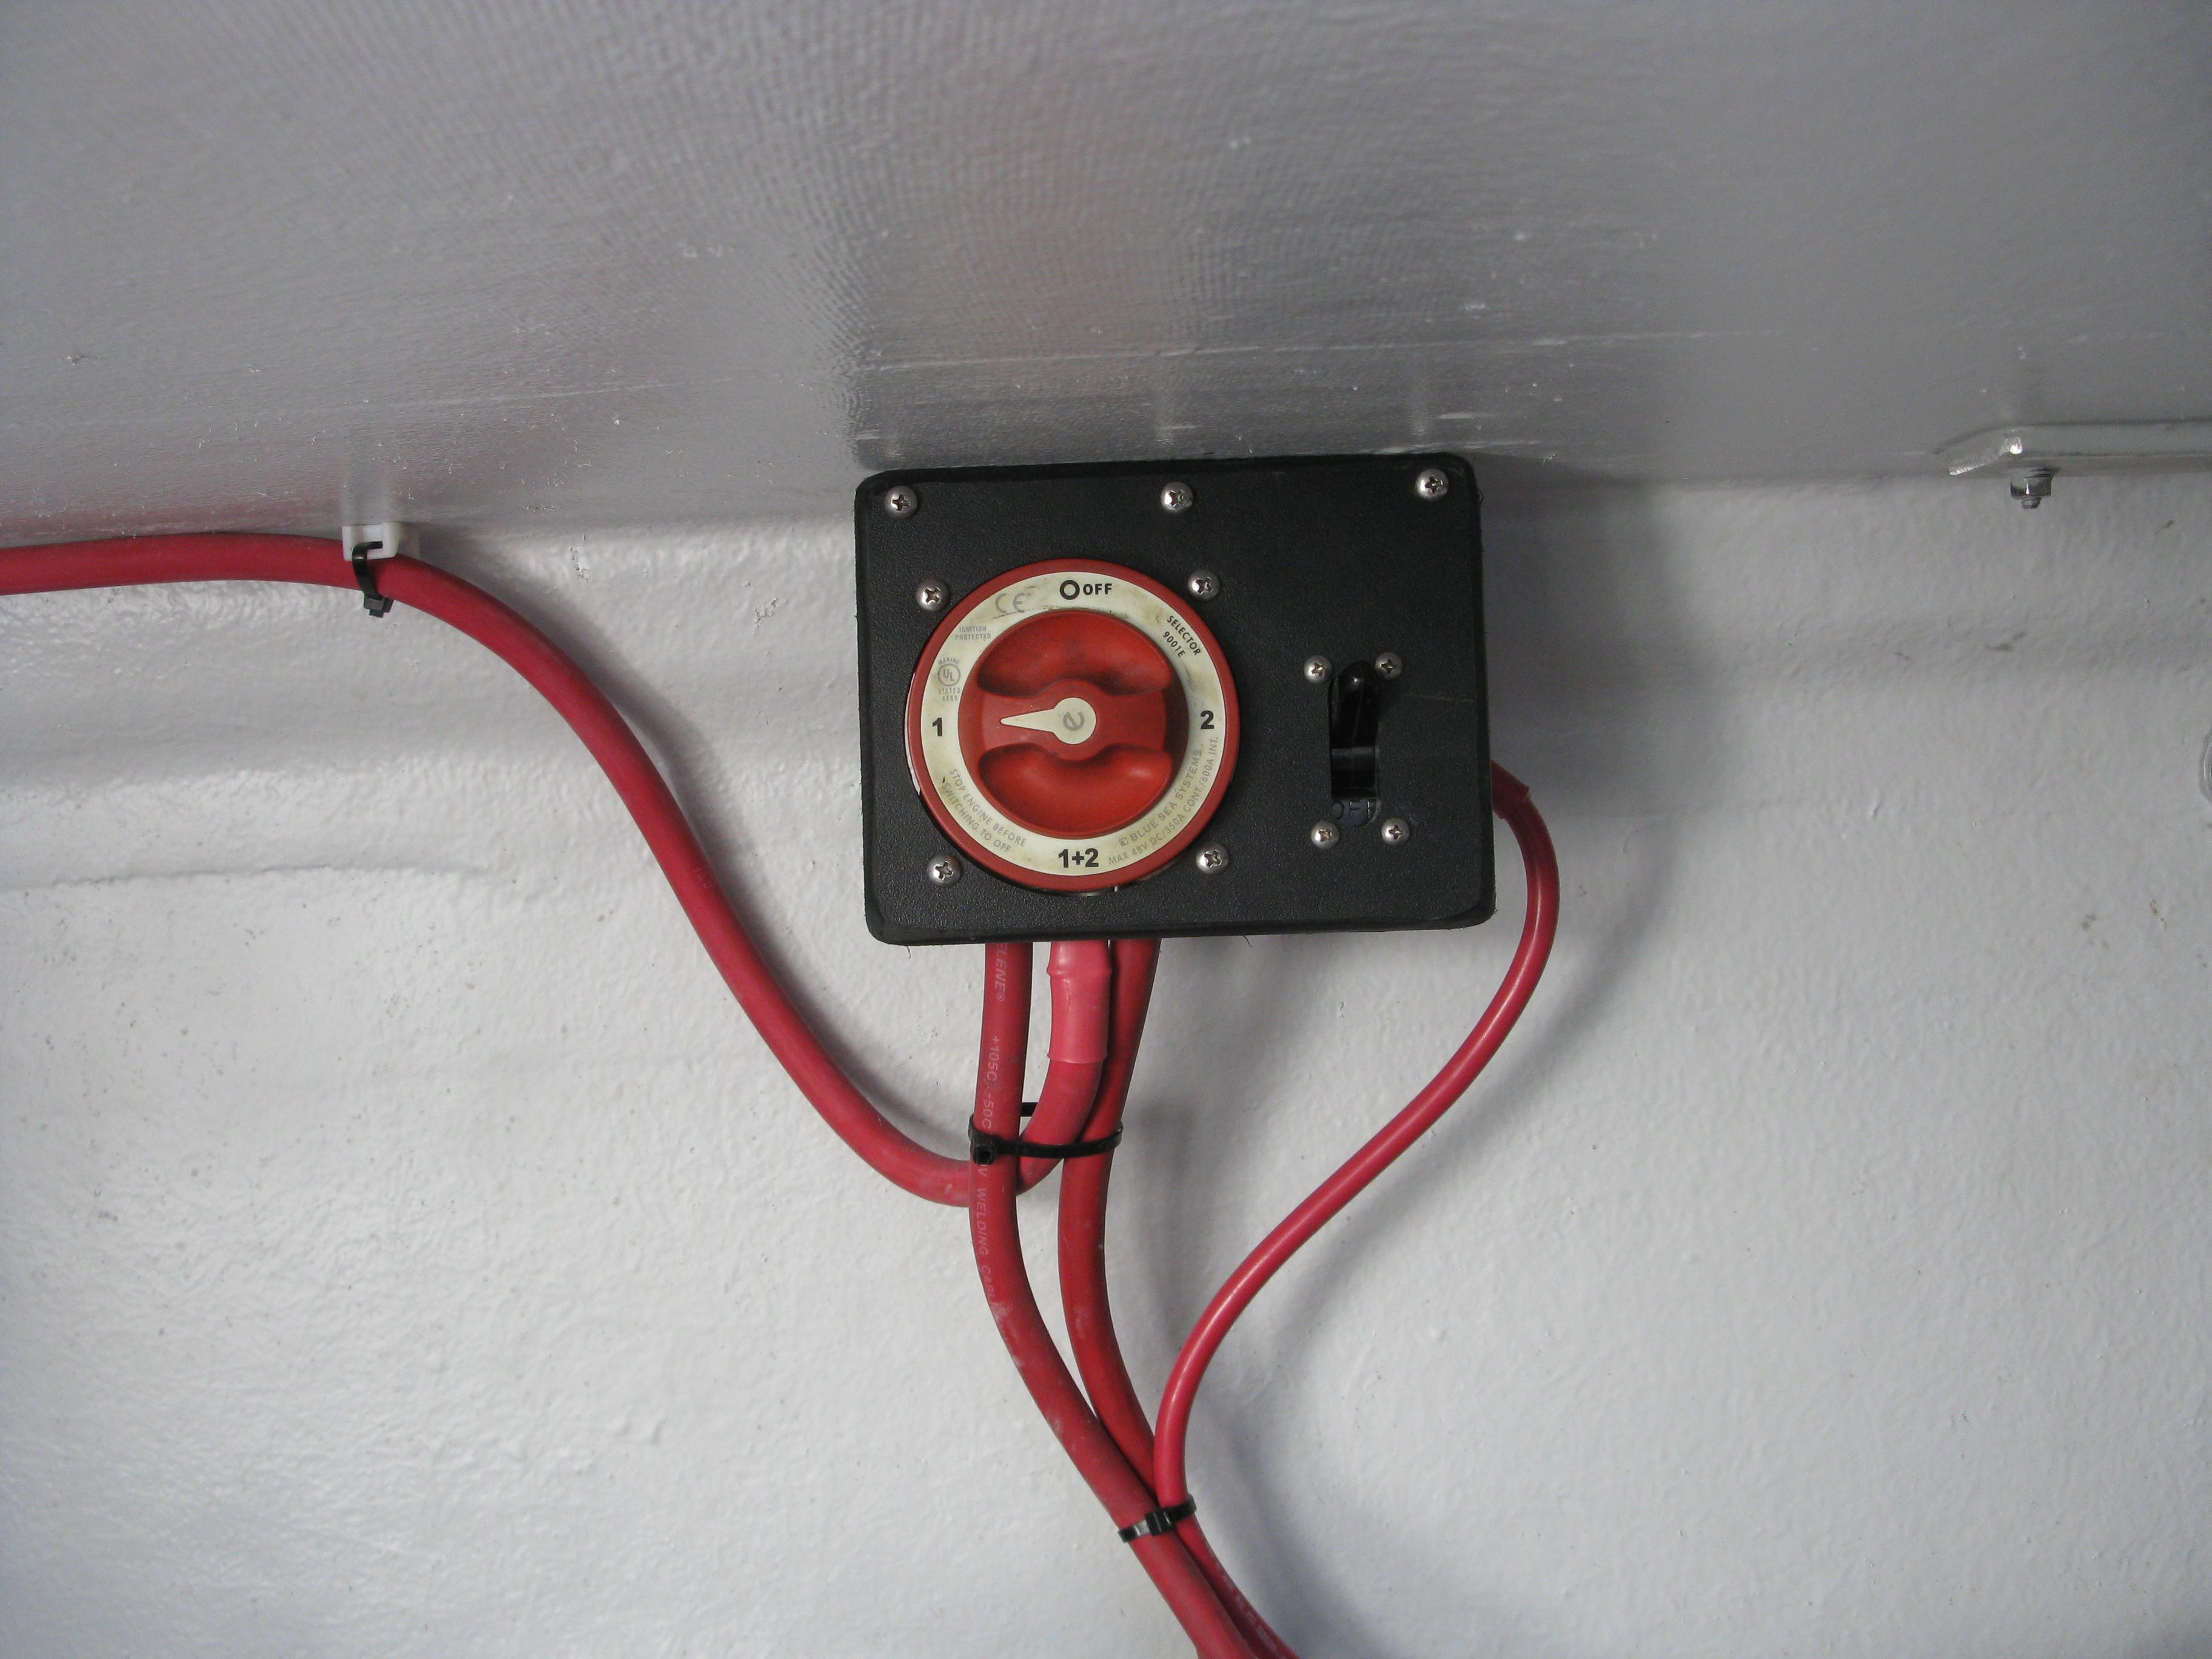 bmw wds wiring diagram system 12 0 bmw image wds bmw wiring diagram system model 5 e39 from 09 98 wiring on bmw wds wiring